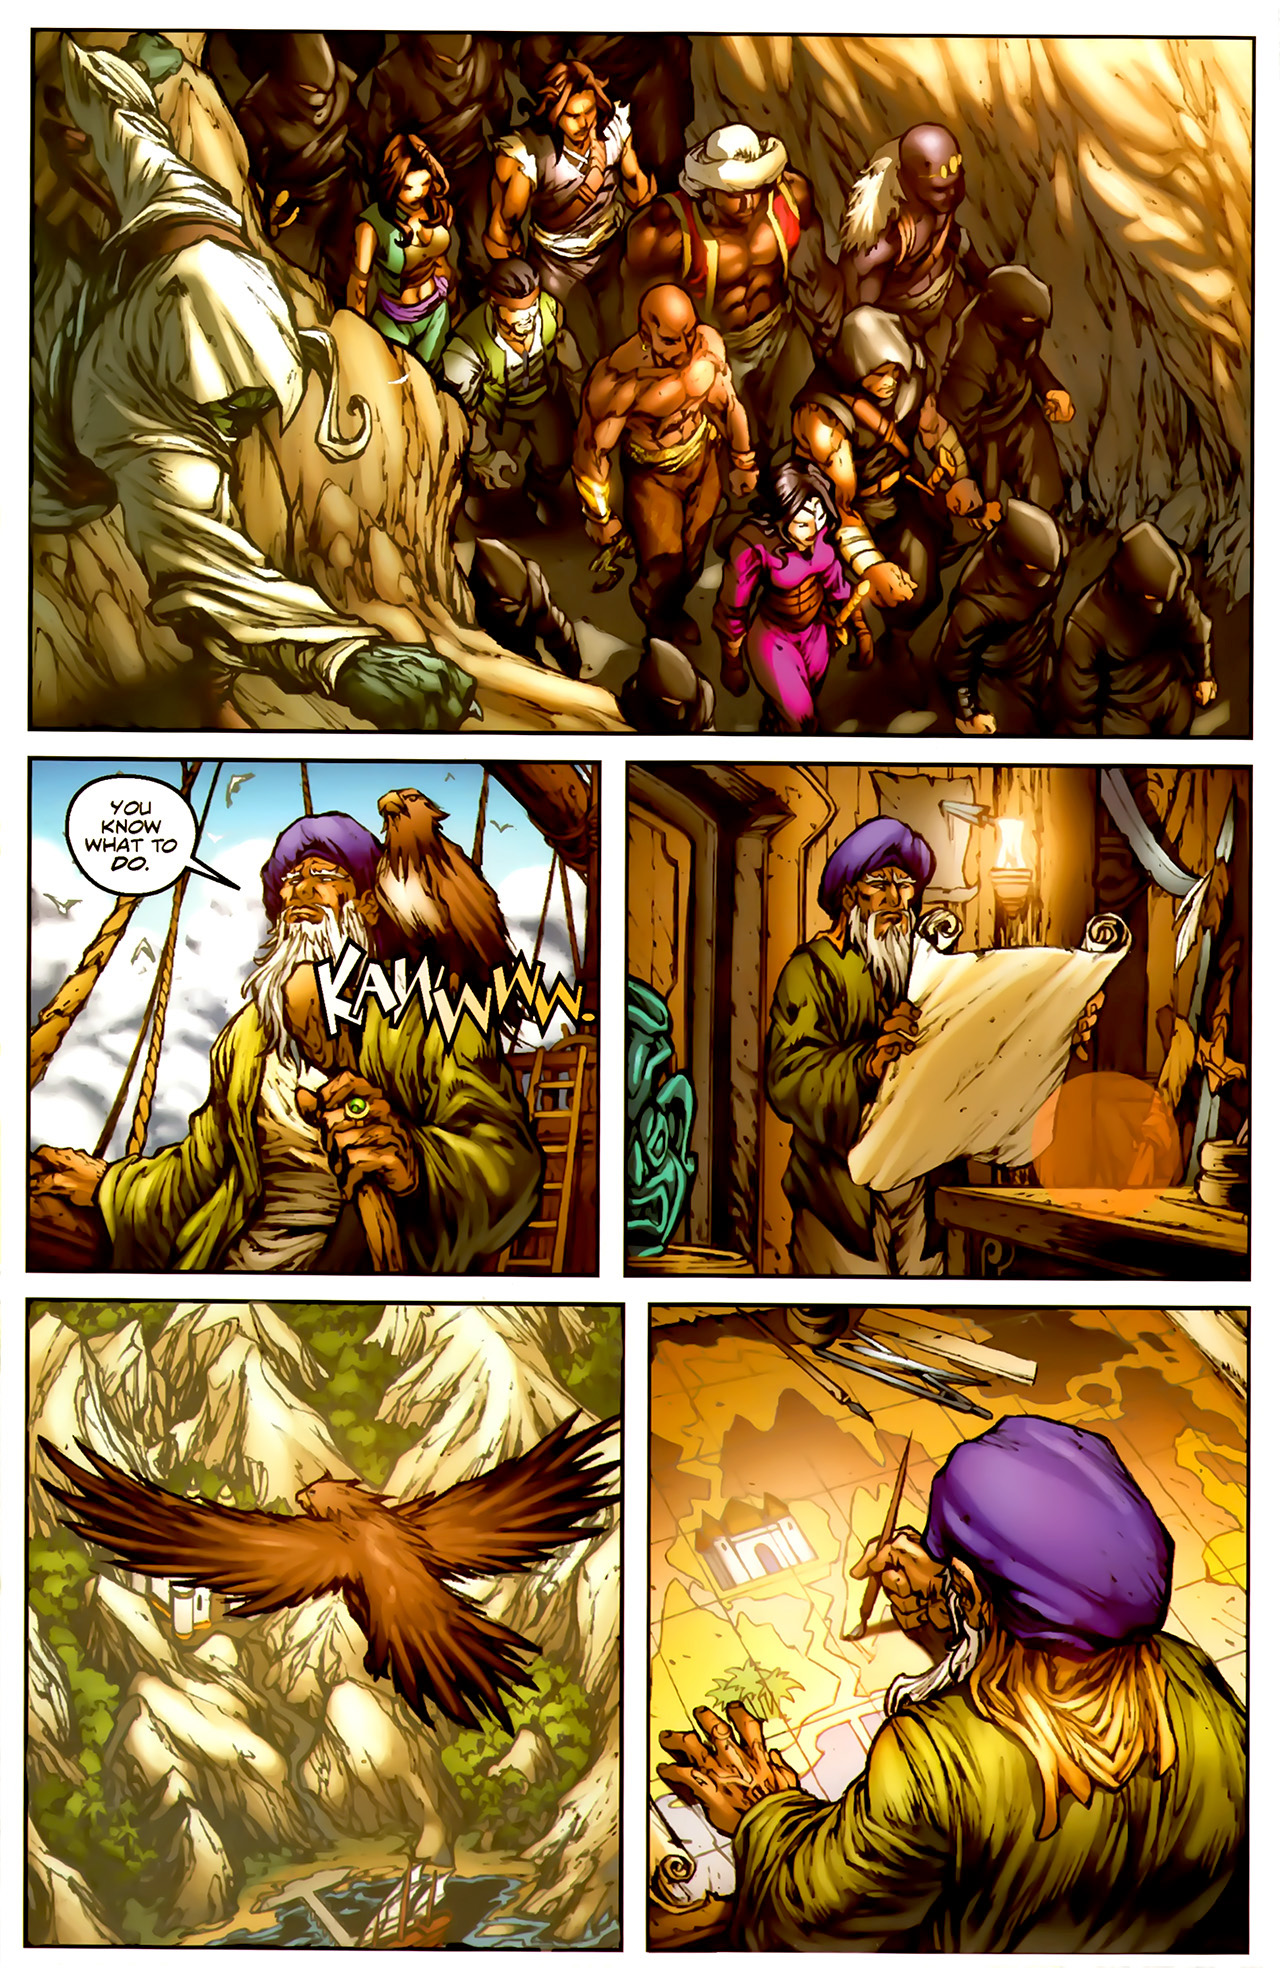 Read online 1001 Arabian Nights: The Adventures of Sinbad comic -  Issue #1 - 15